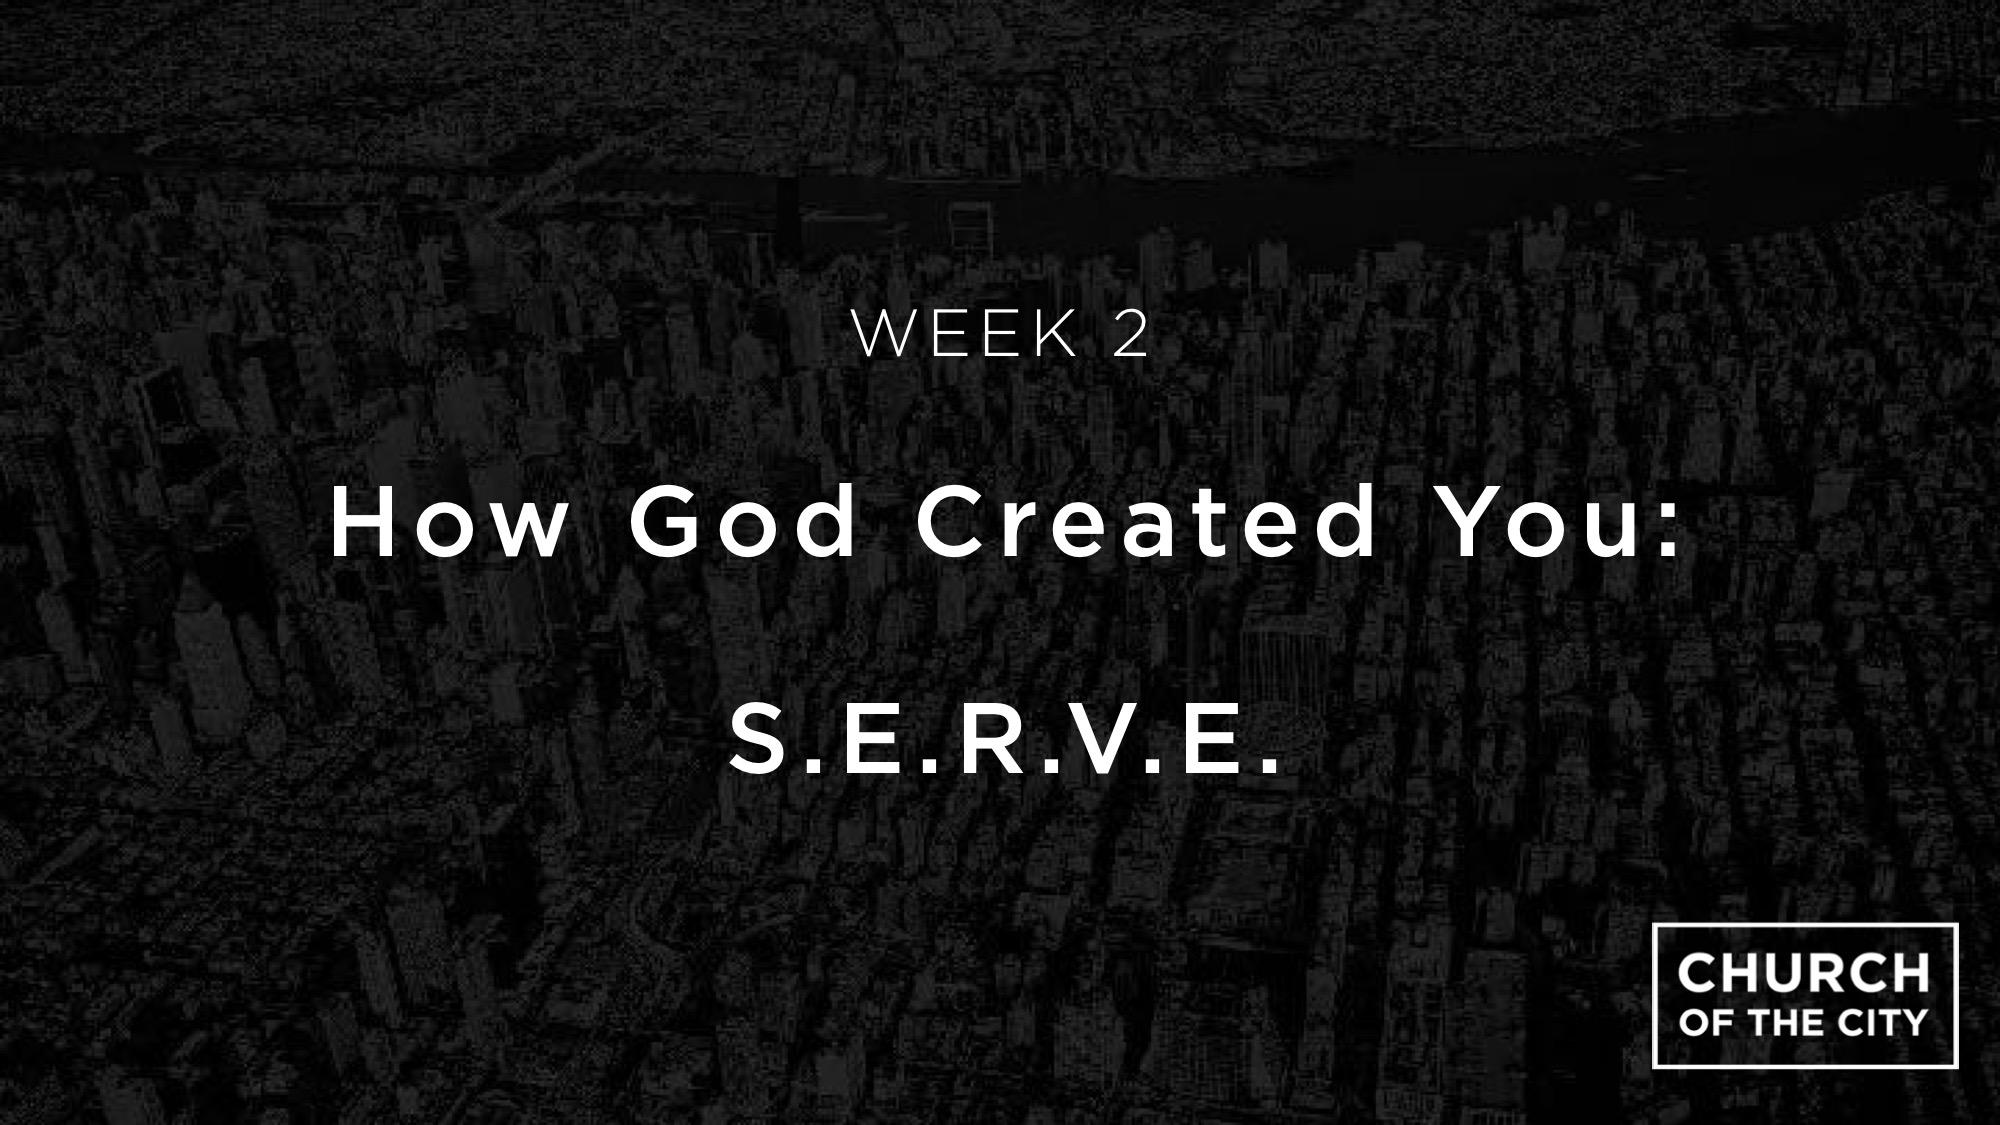 2017-09-24 - Serve Course - Week 2 (Suzy Silk) 4.jpeg